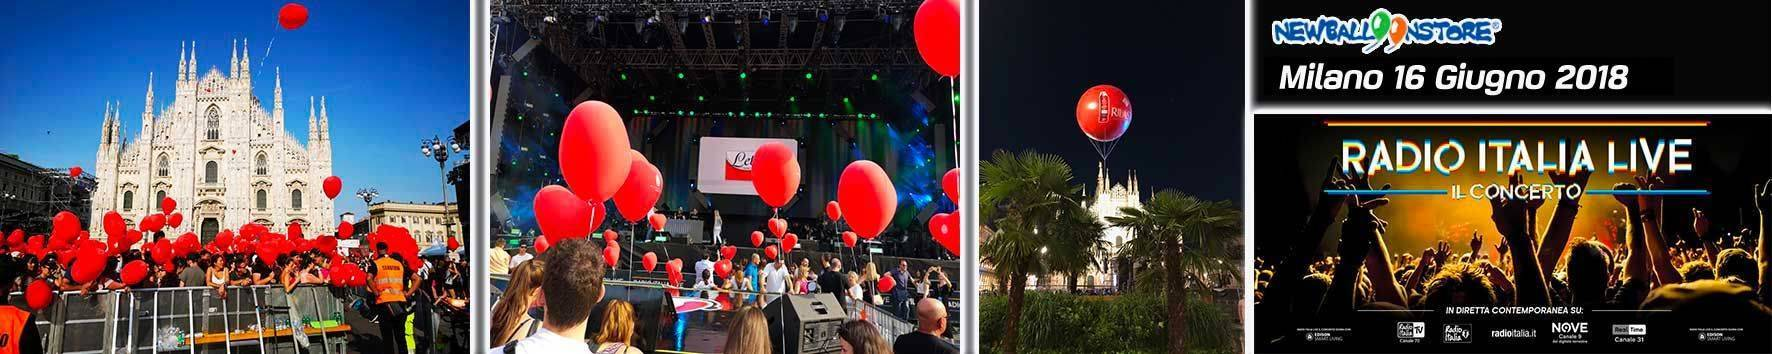 palloncini-radio-italia-newballoonstore